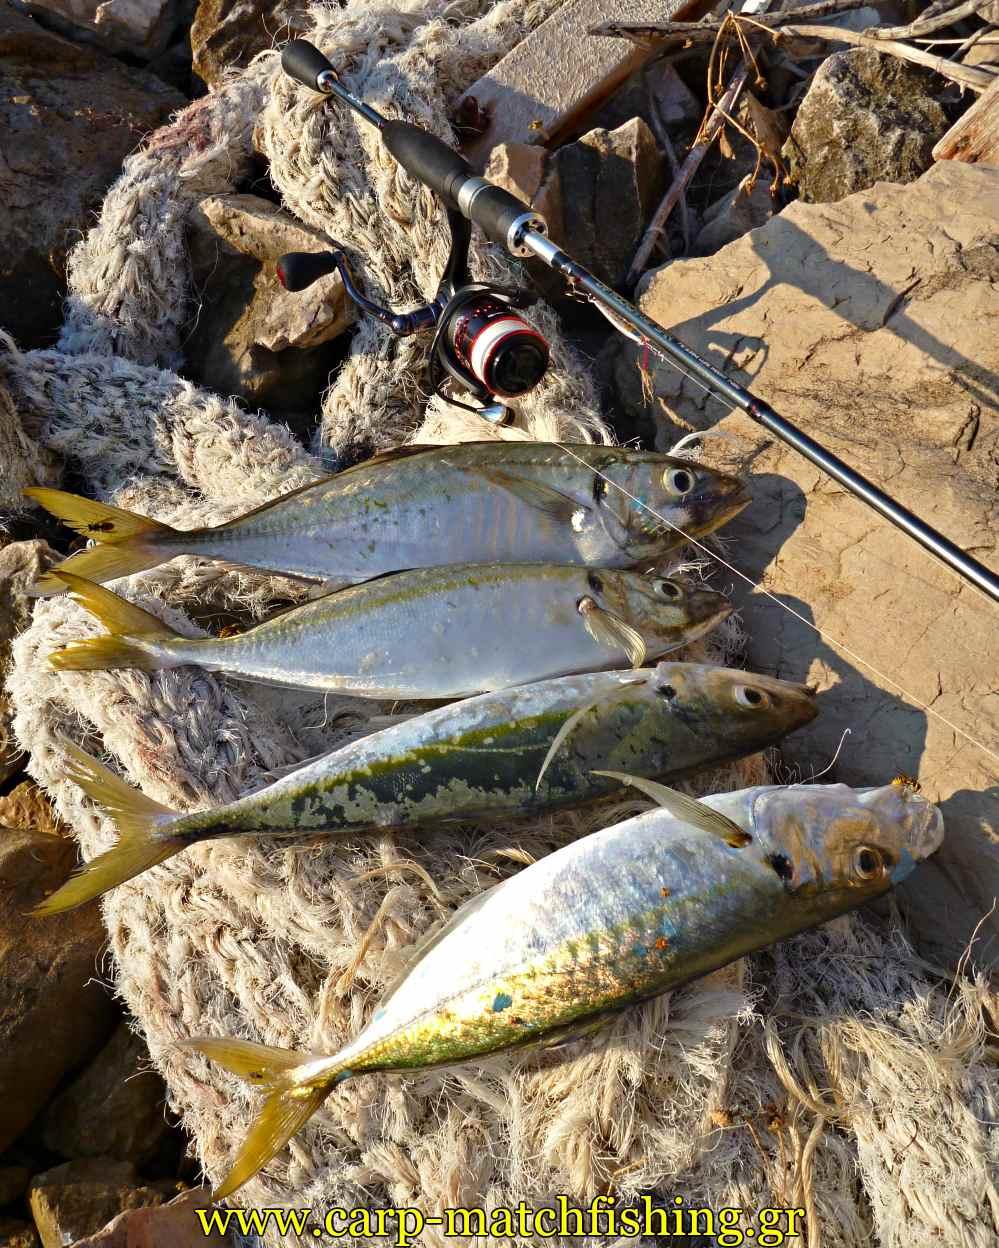 ajing-horse-mackerel-metal-jigs-kokkalia-4-carpmatchfishing